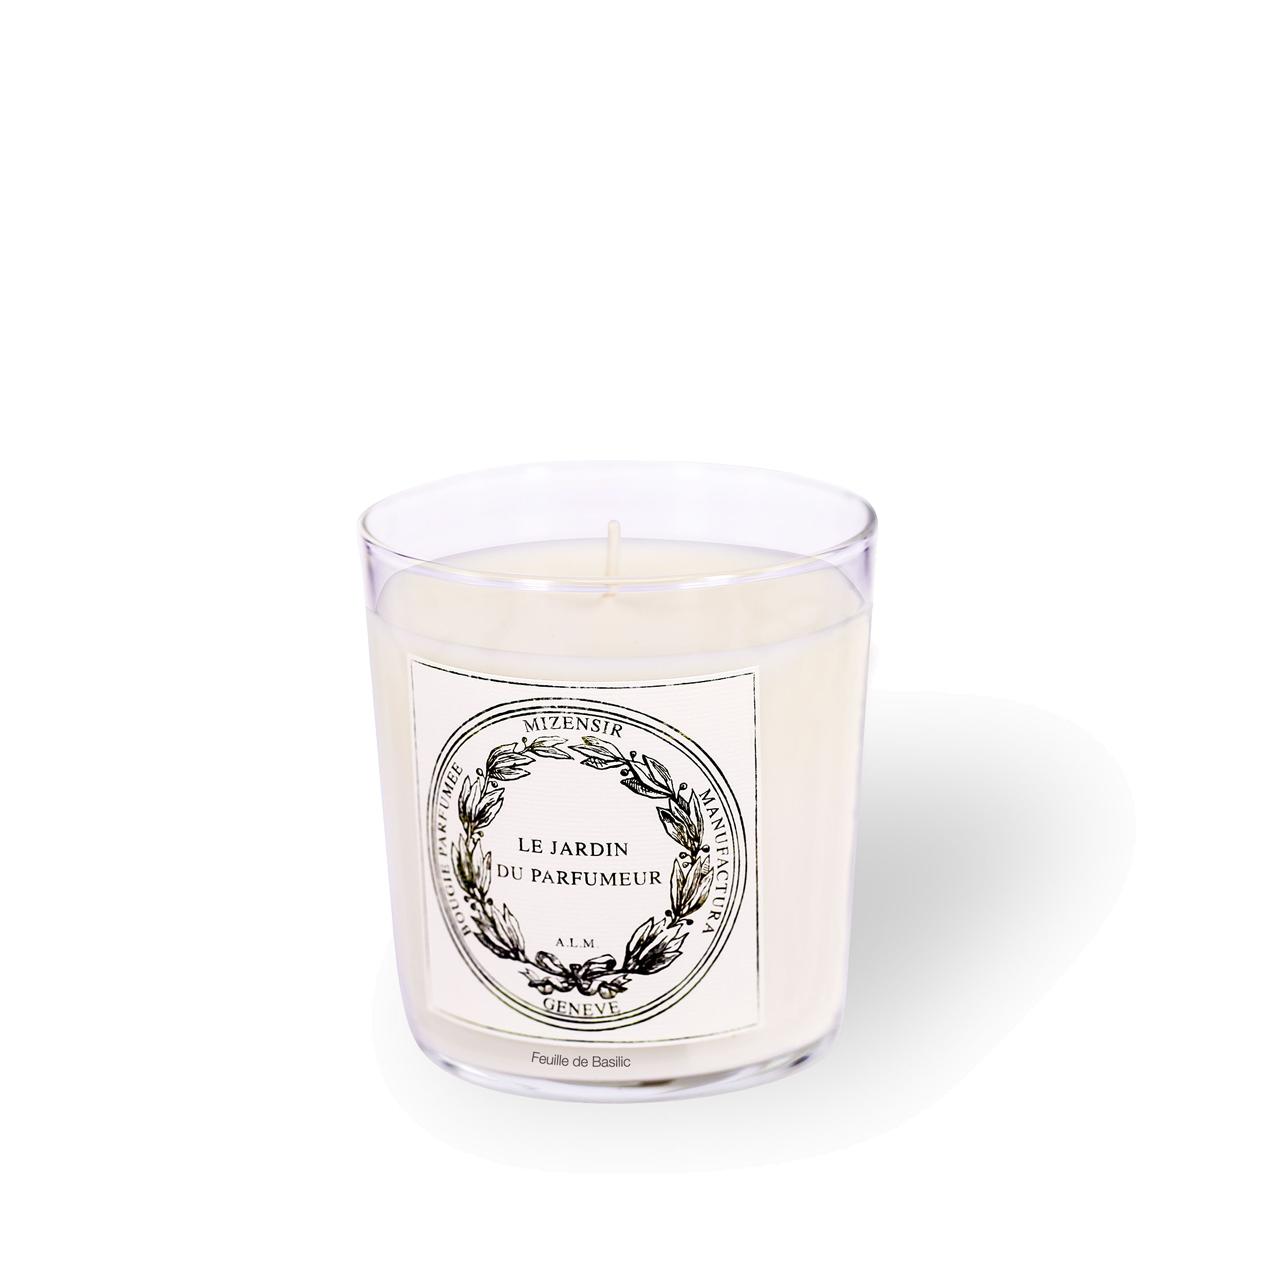 Feuille de Basilic - Candle